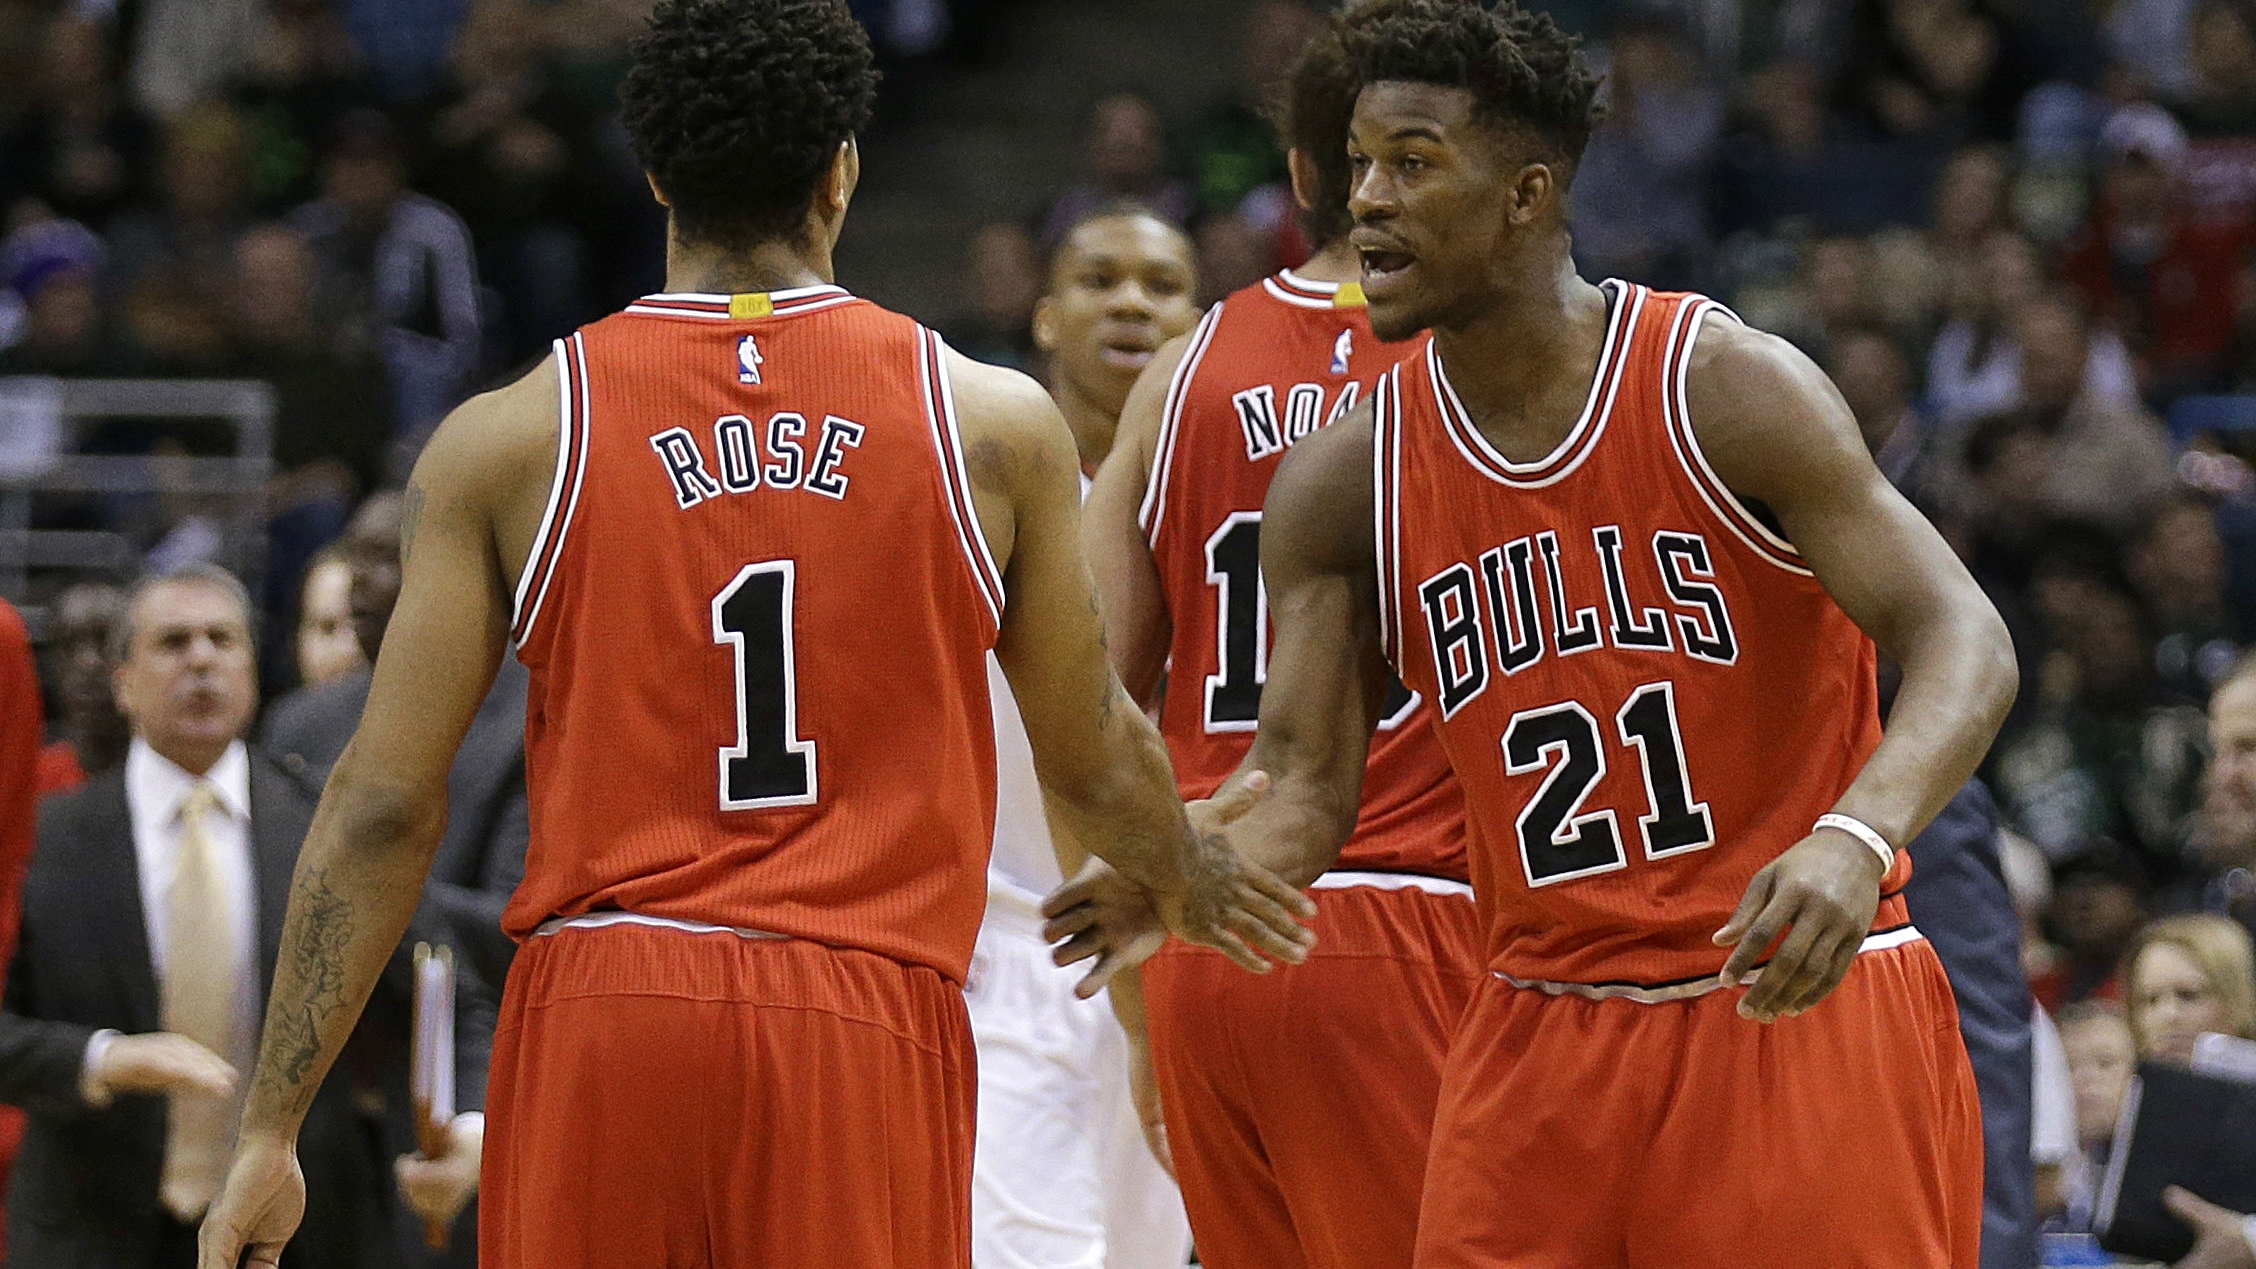 ccaa3460f43 NBA playoffs roundup  Bulls blast Bucks to advance